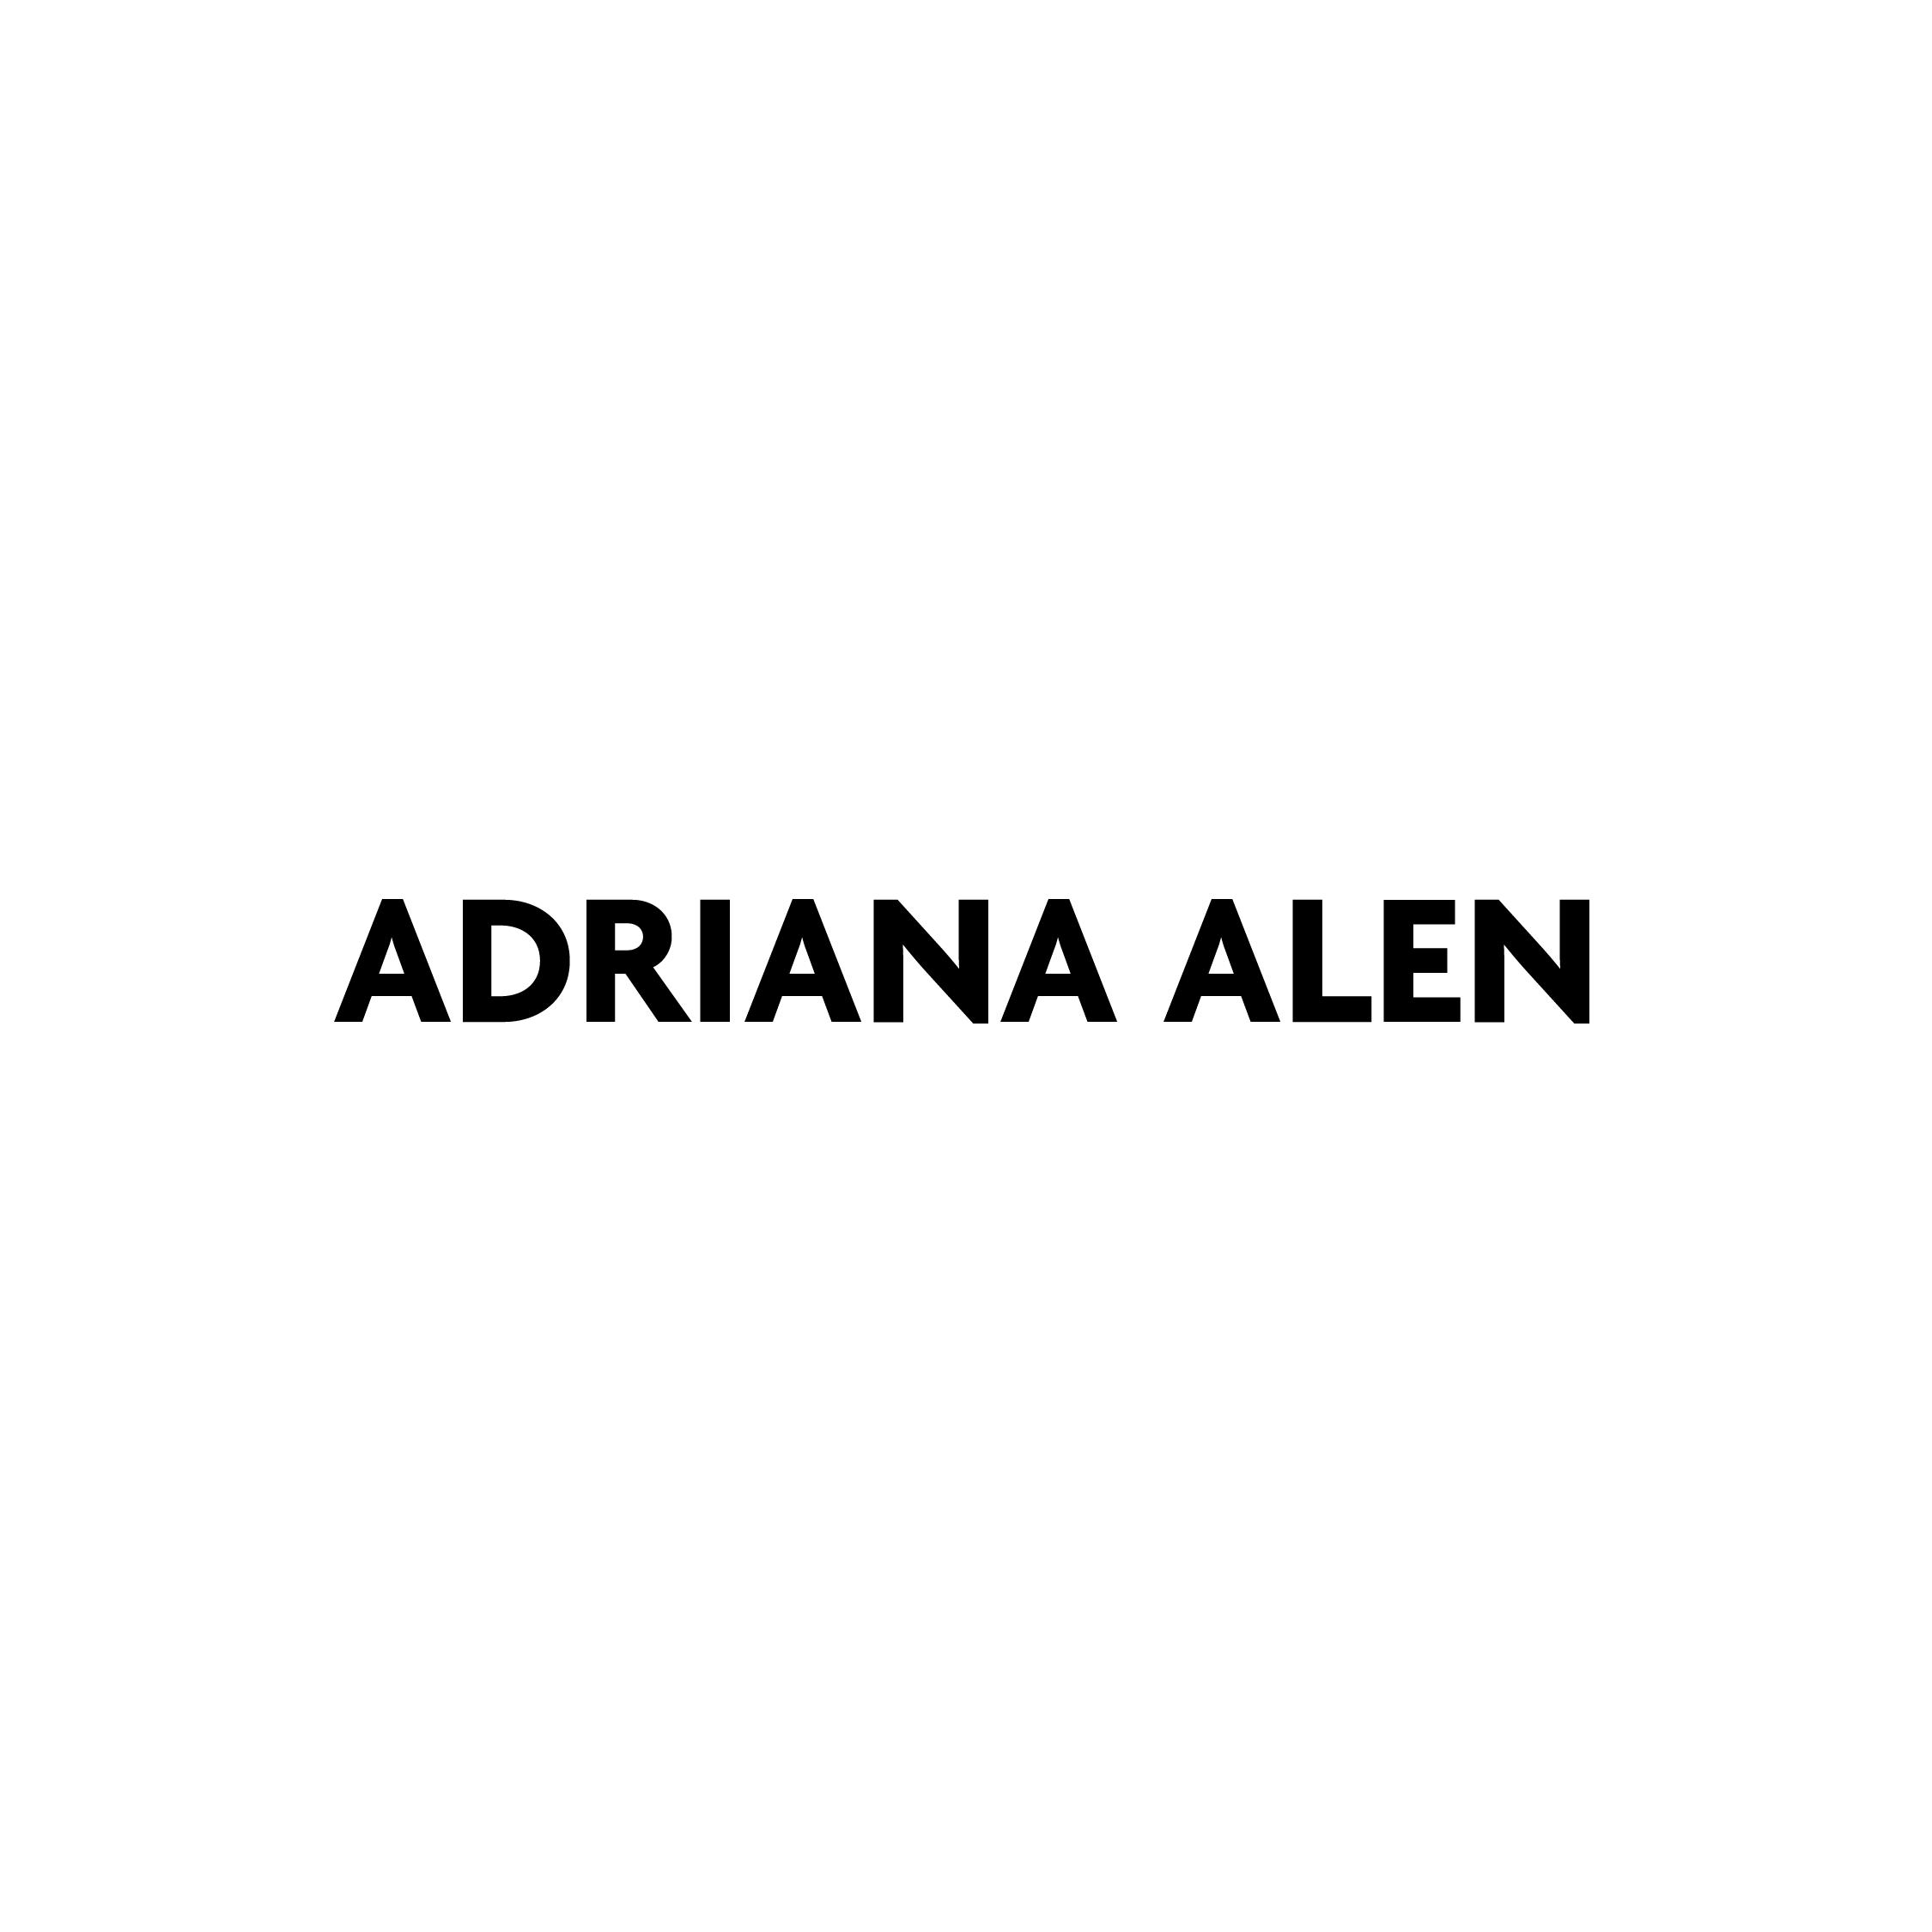 Adriana Alen